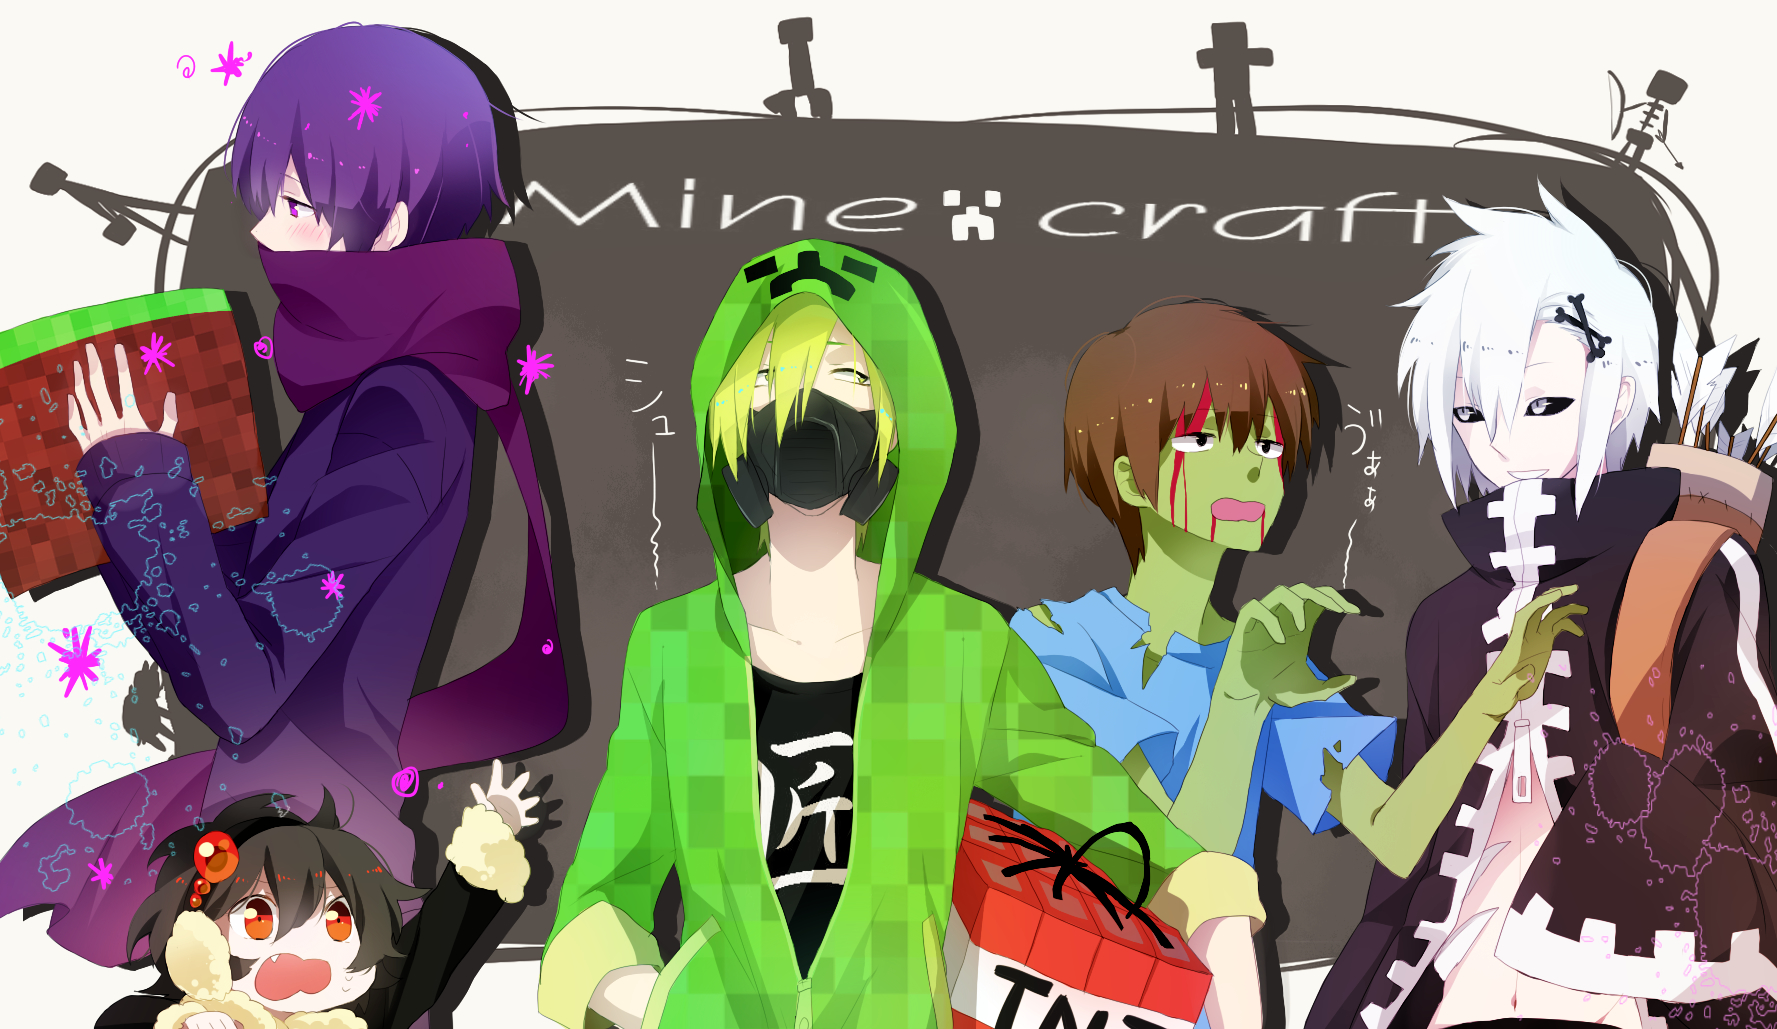 маекрафт картинки аниме